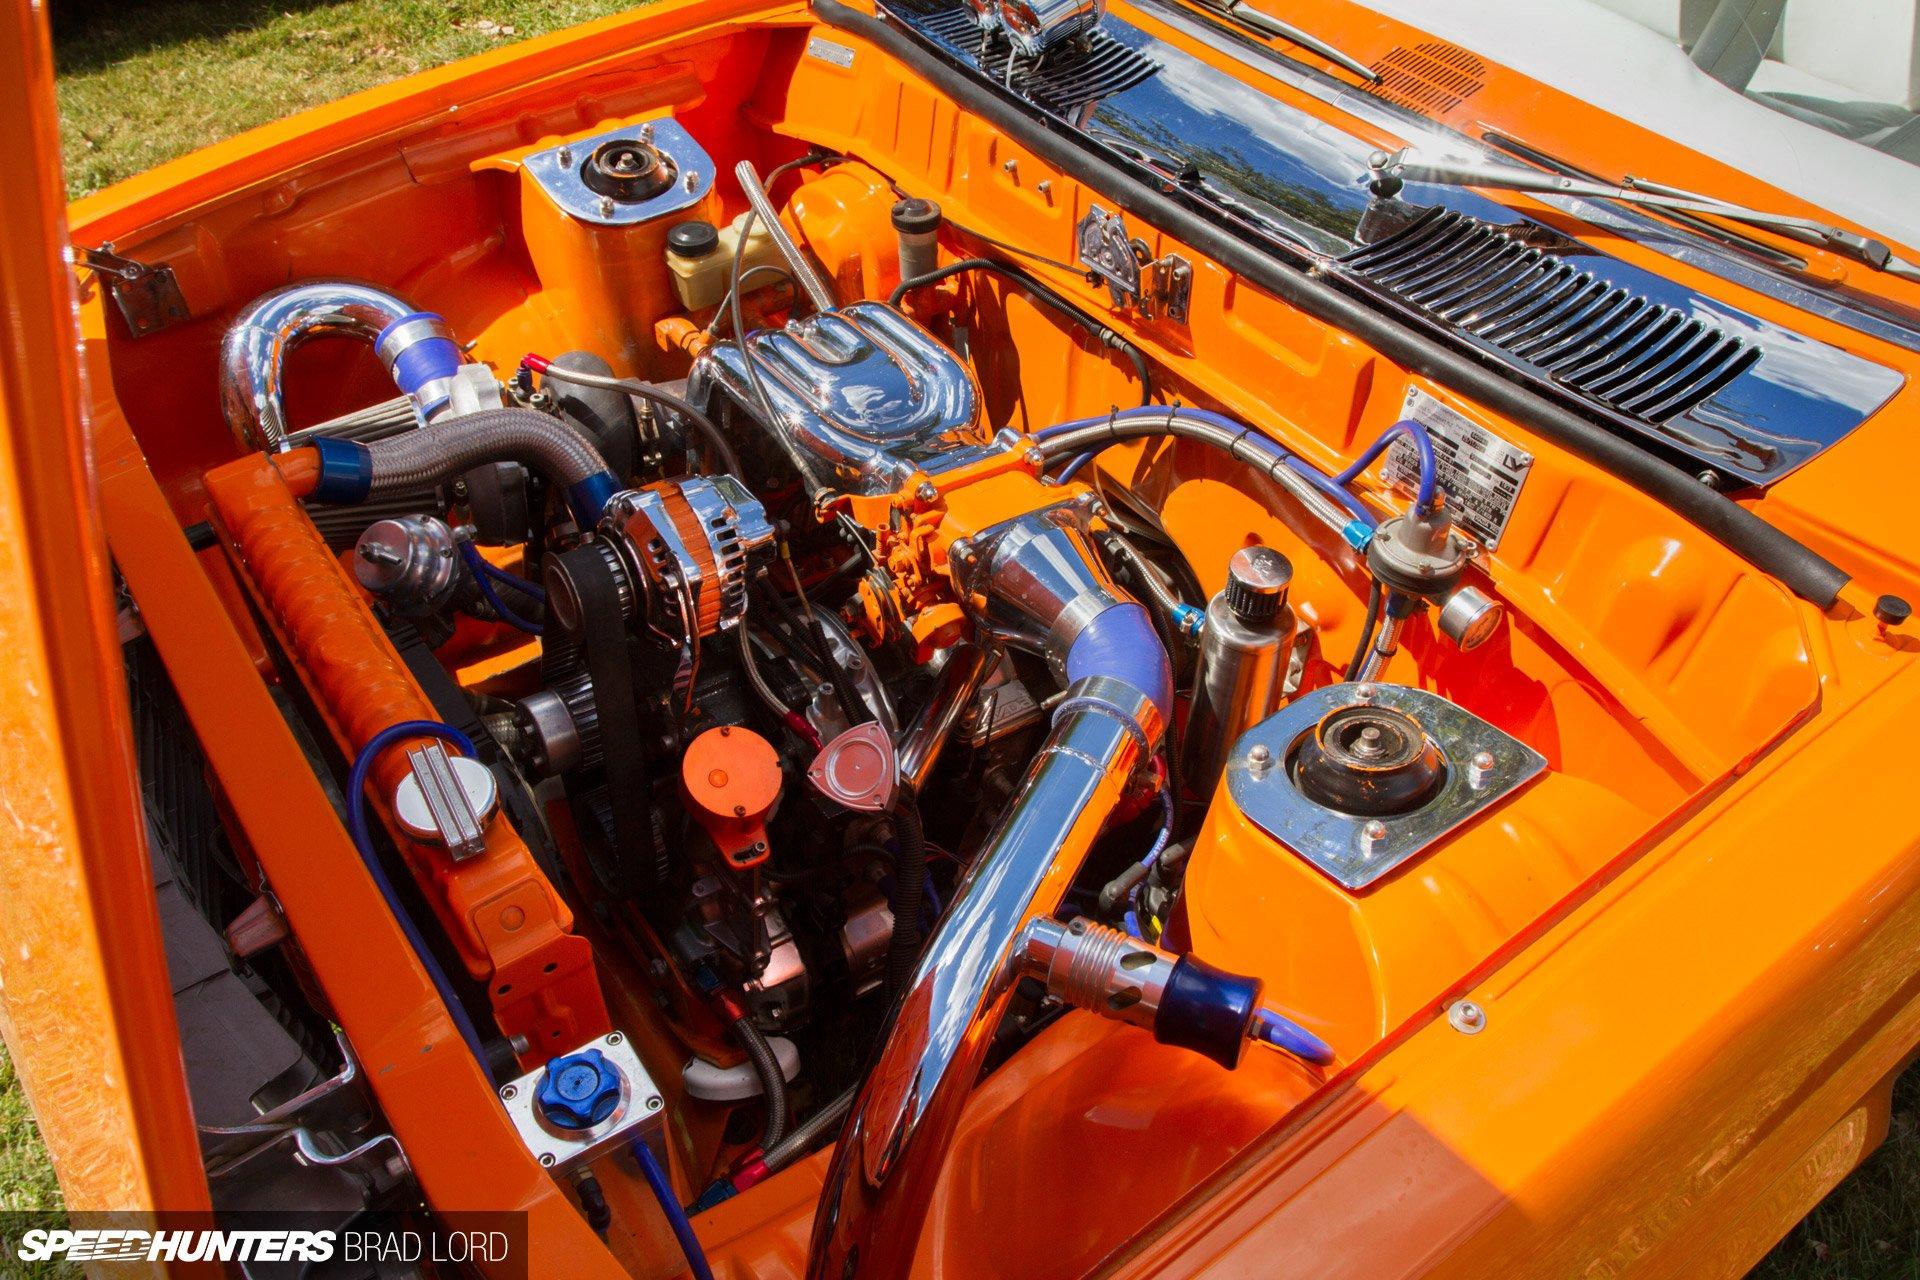 Mazda 929 Rx 4 Tuning Rx4 Engine G Wallpaper 1920x1280